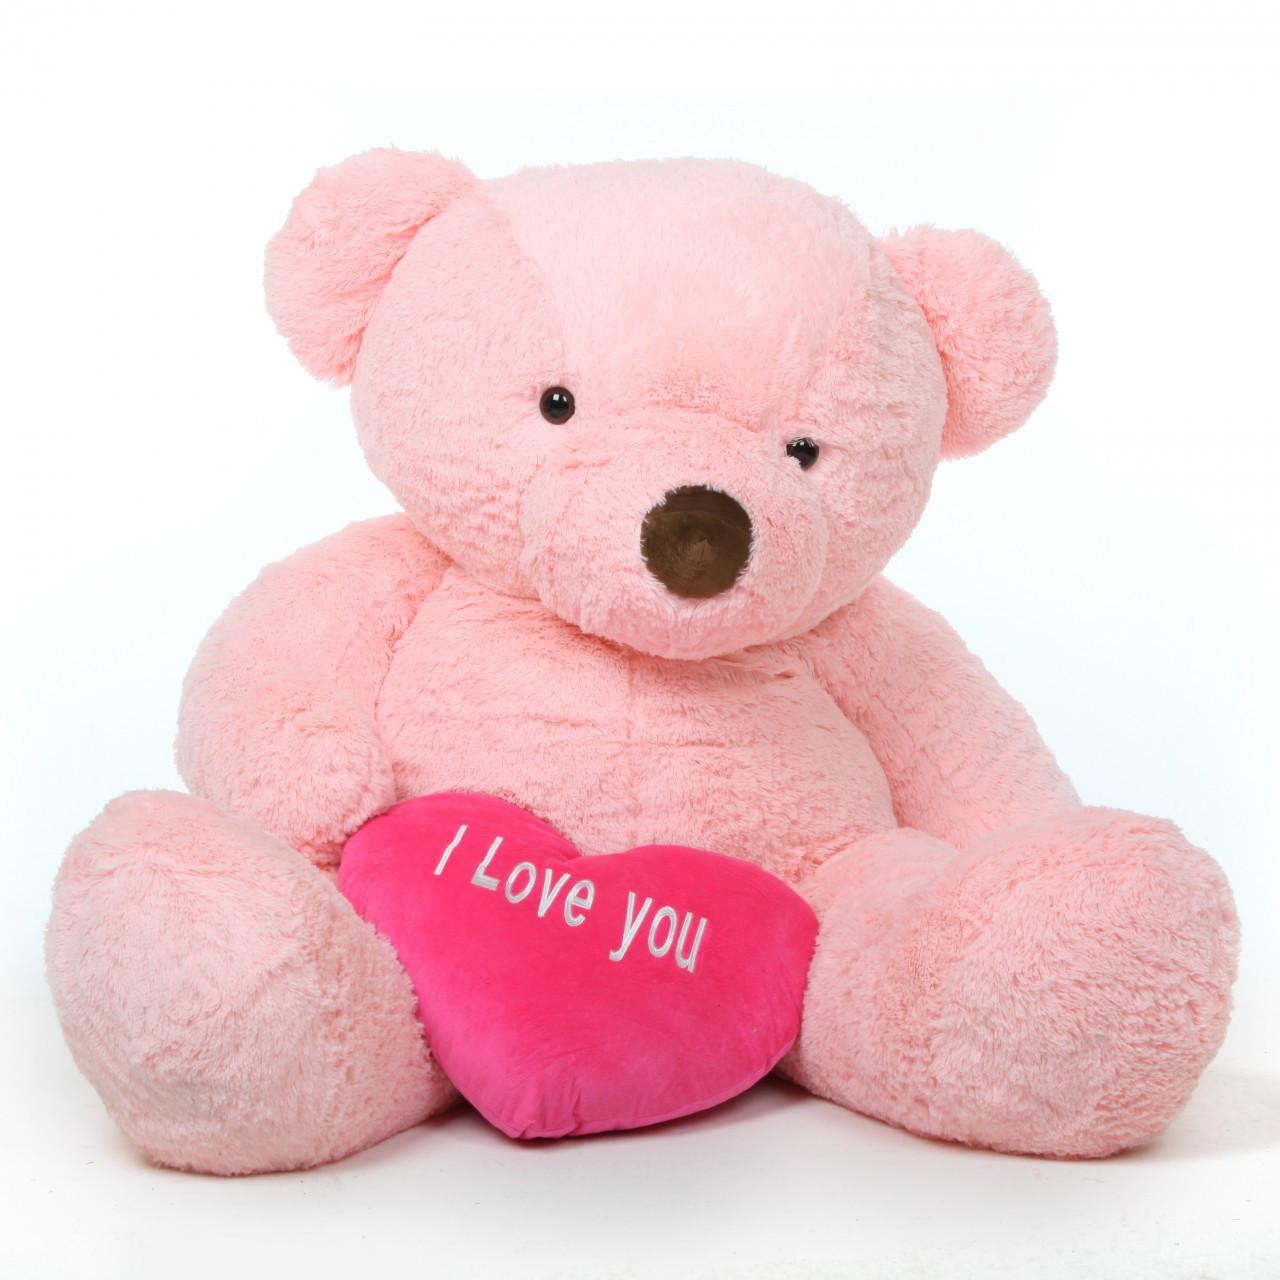 Life Size 5ft Pink Teddy Bear Gigi Chubs with I Love You Heart